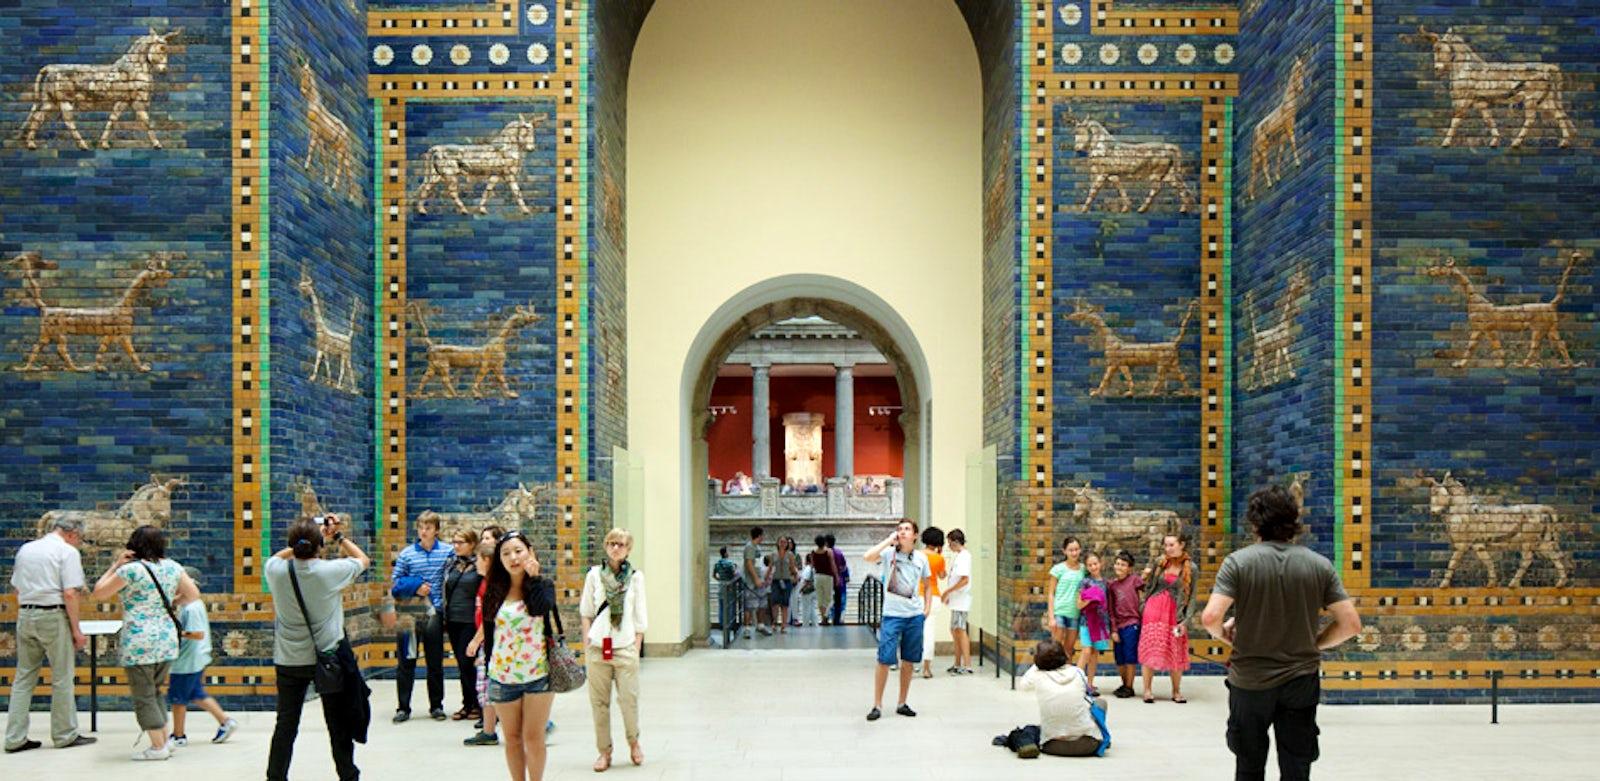 Cover Picture © Credits to© Staatliche Museen zu Berlin / Achim Kleuker